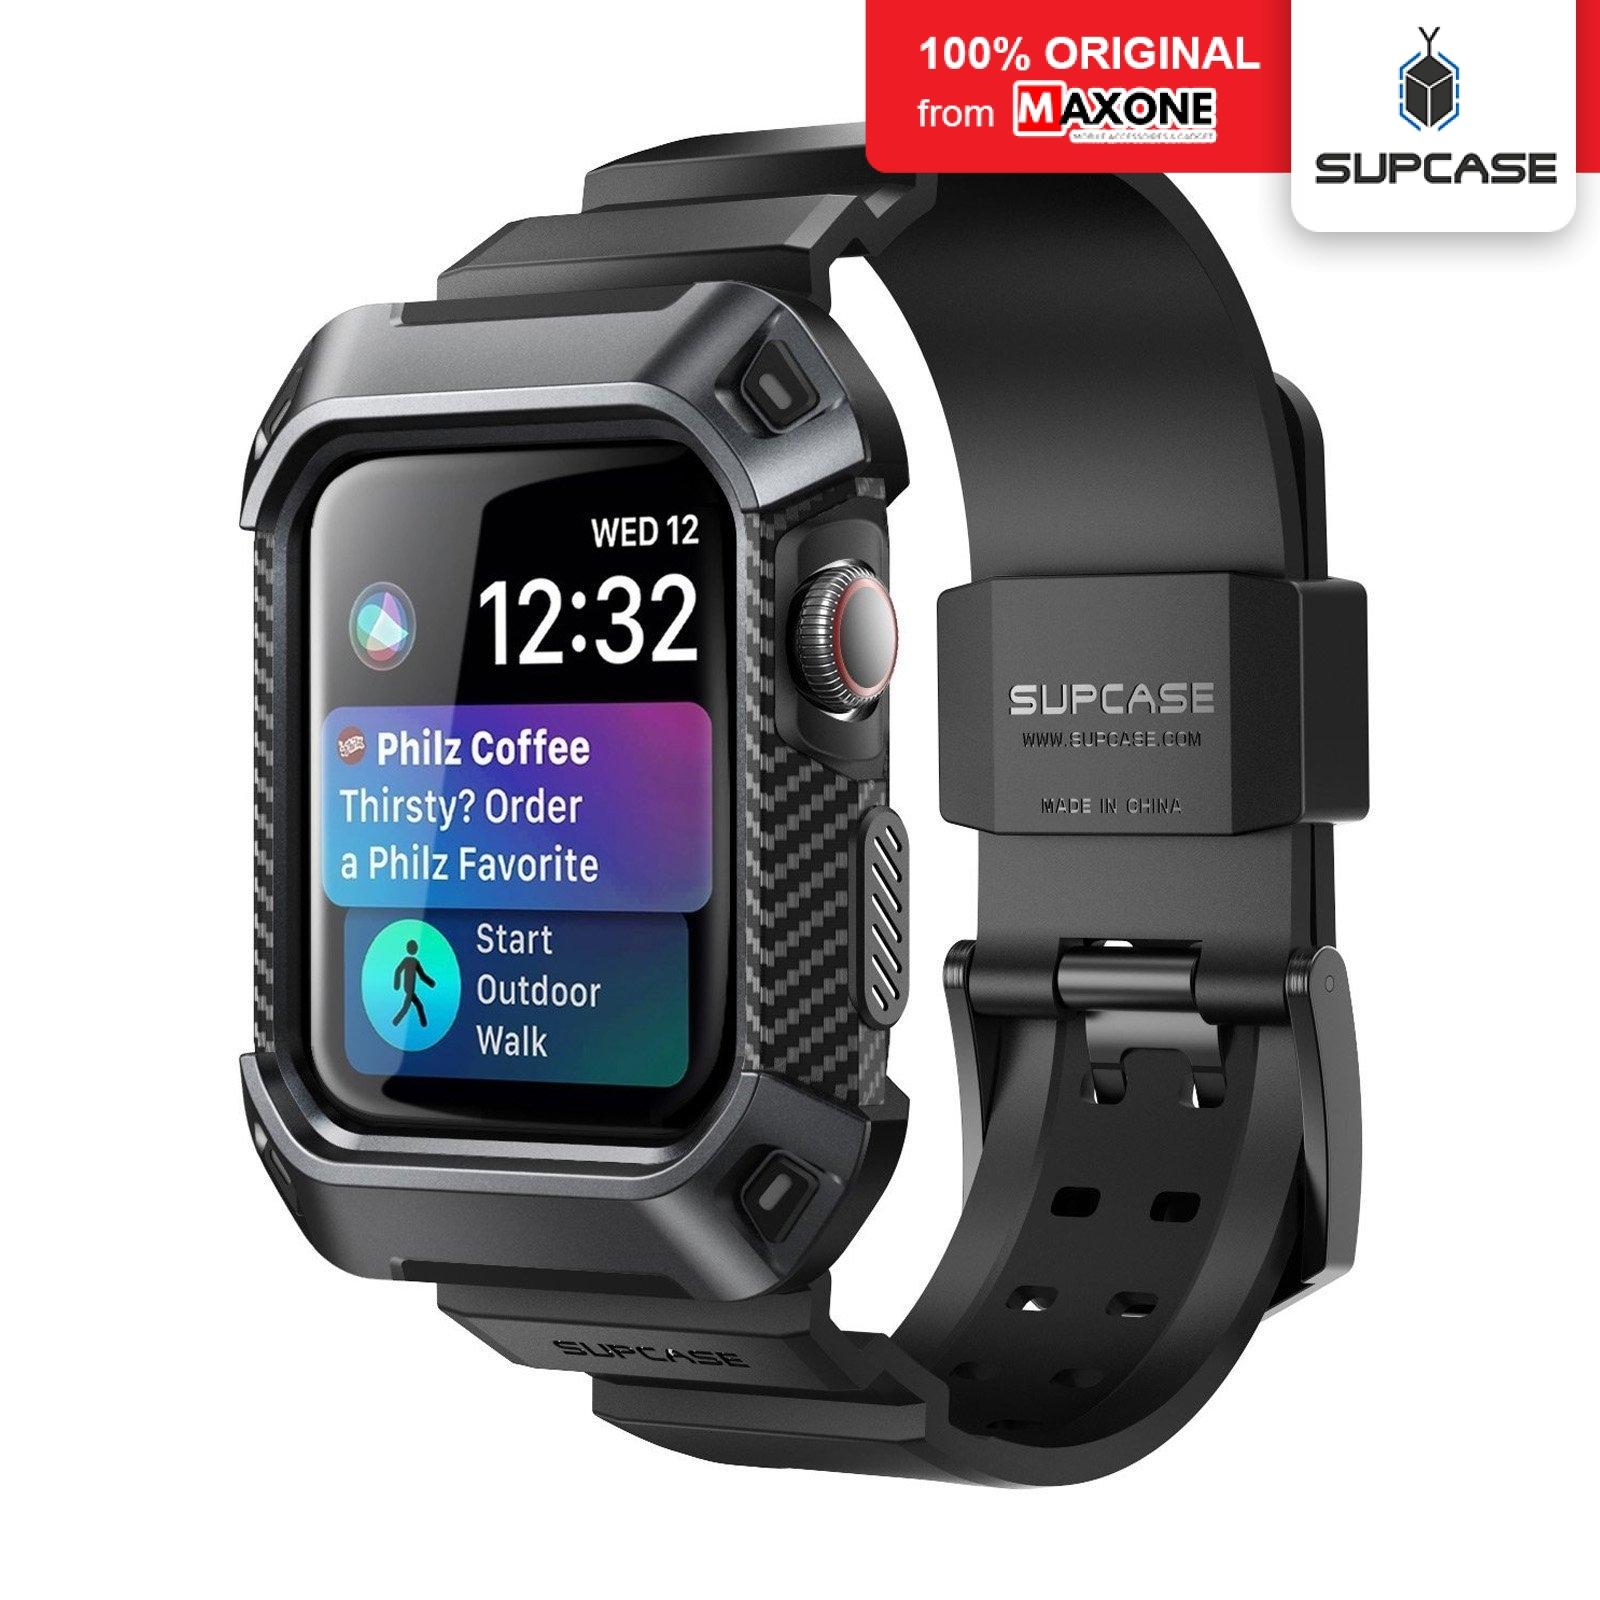 HJXP Original SUPCASE UB Pro Apple Watch Series 6 / 5 / 4 / SE 44mm & 40mm Wristband Case